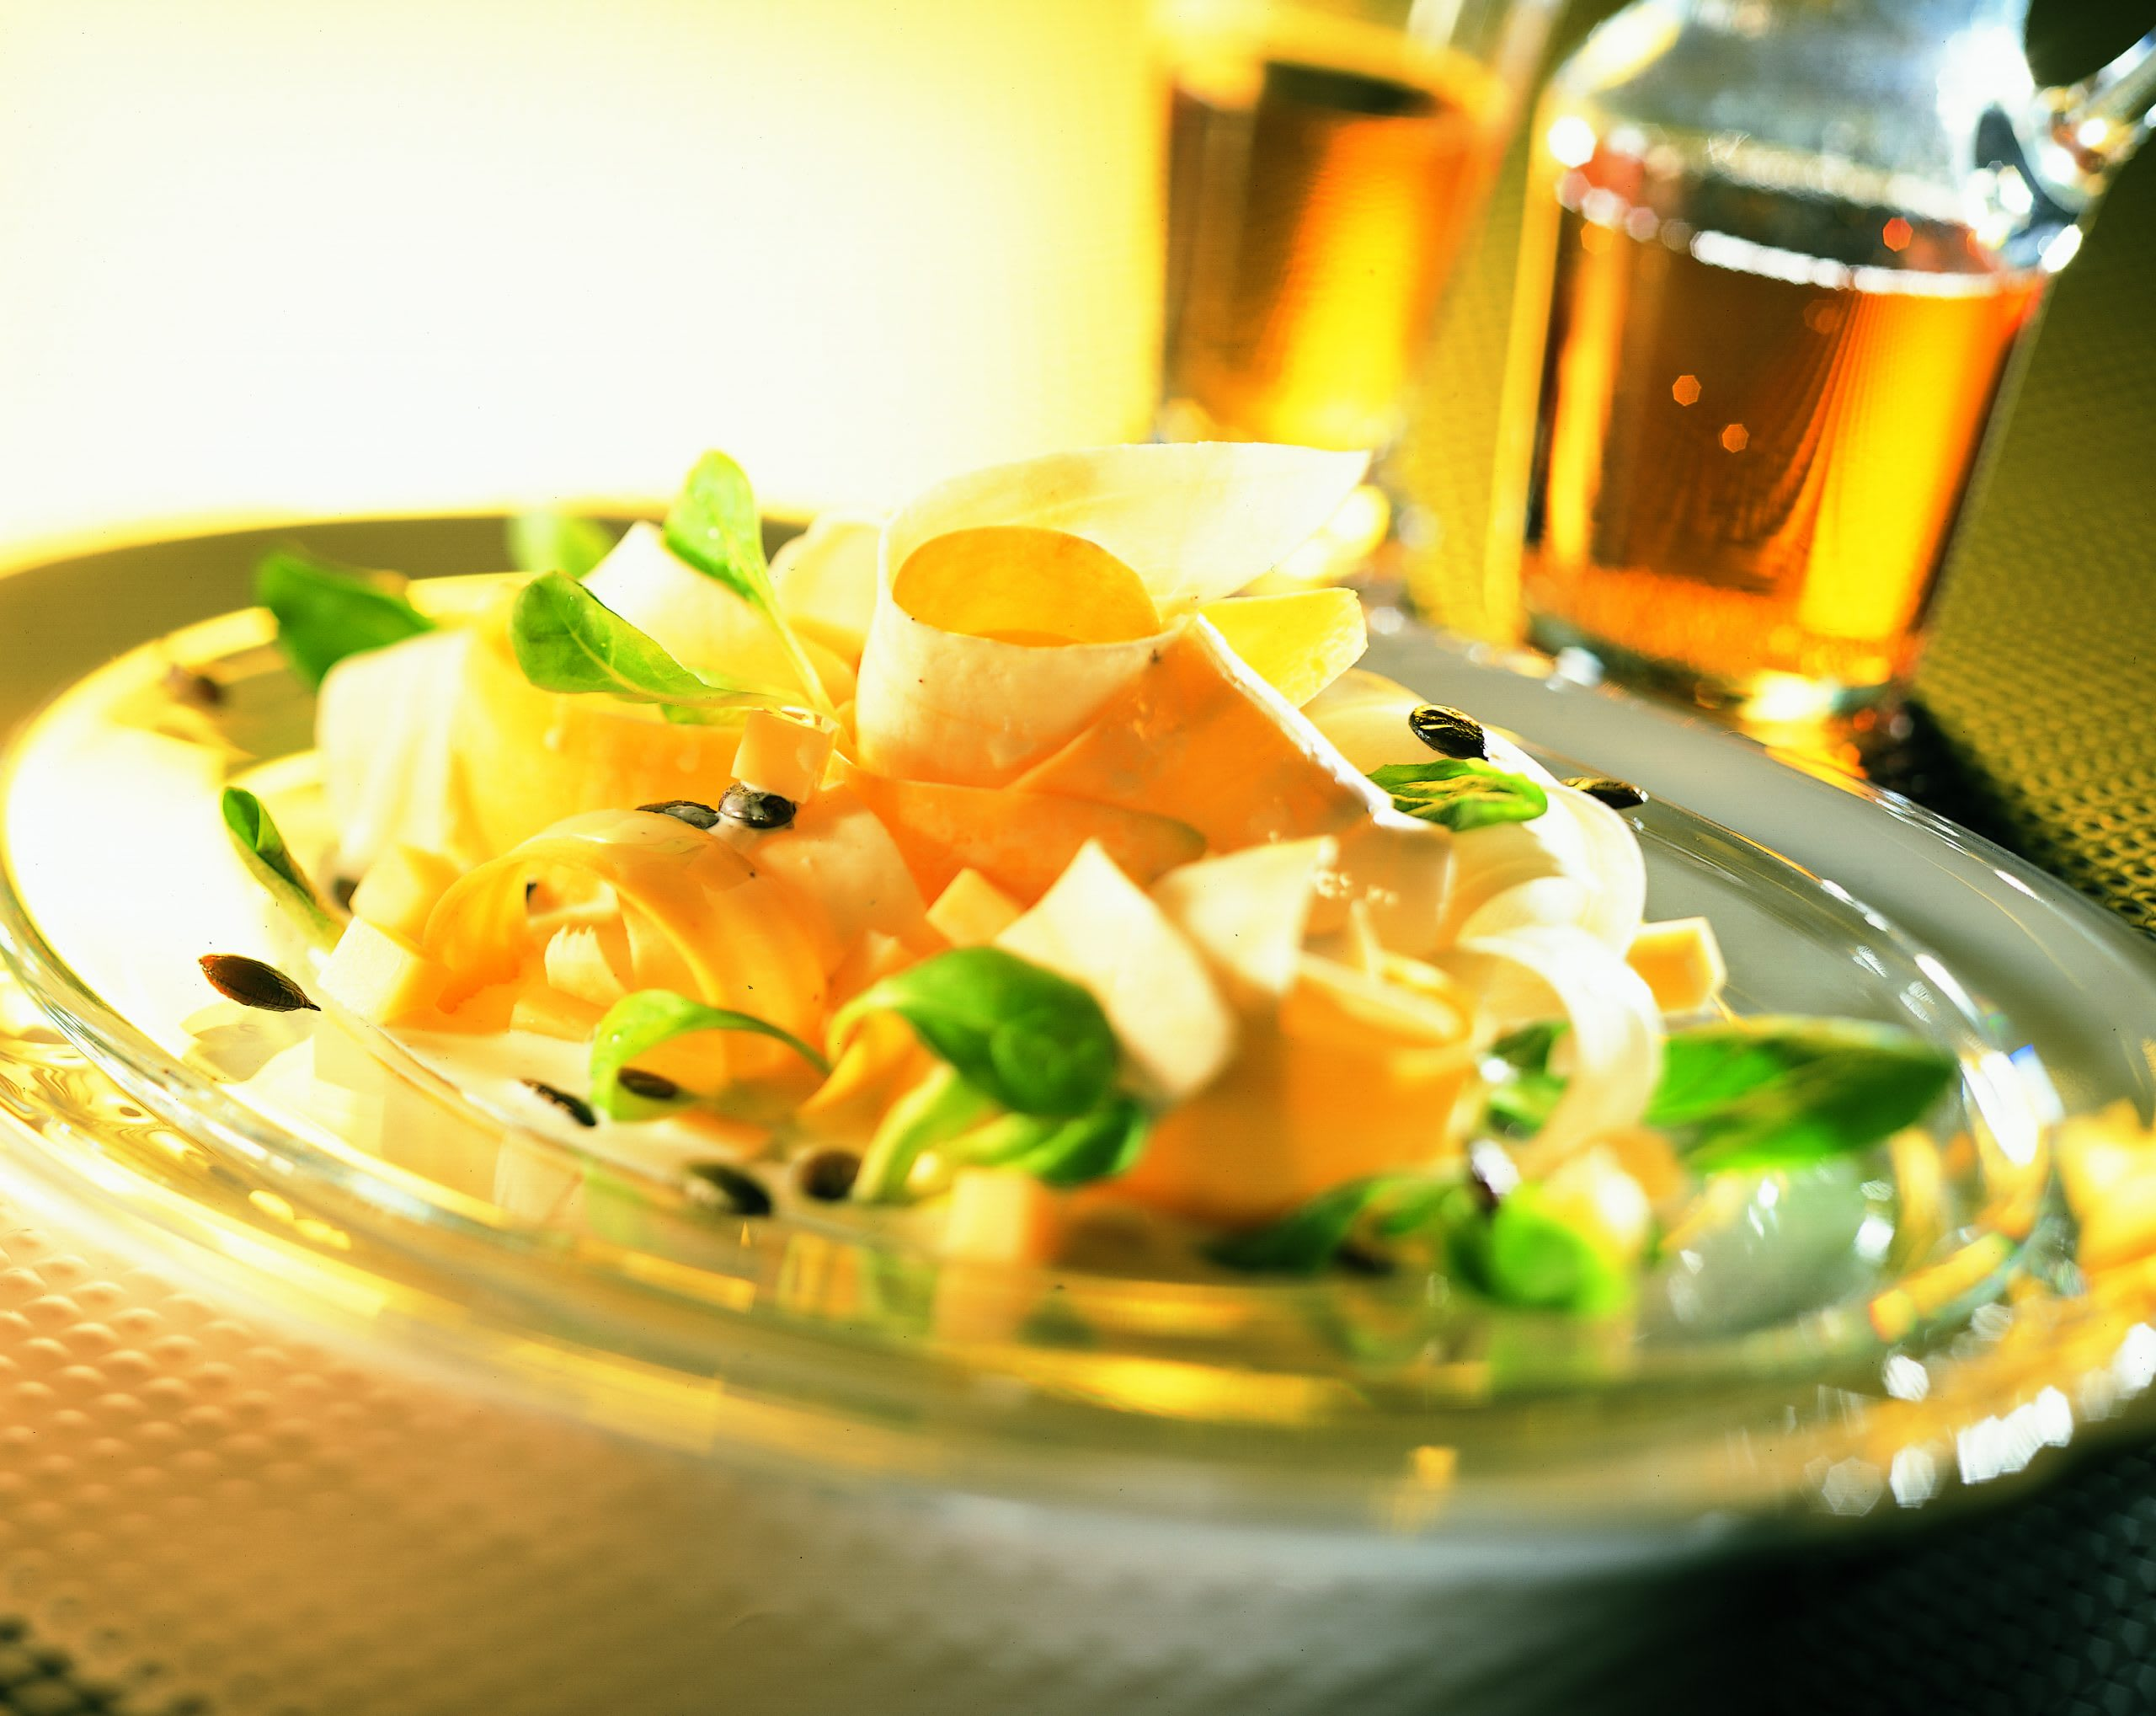 Salade de panais cru à l'emmental